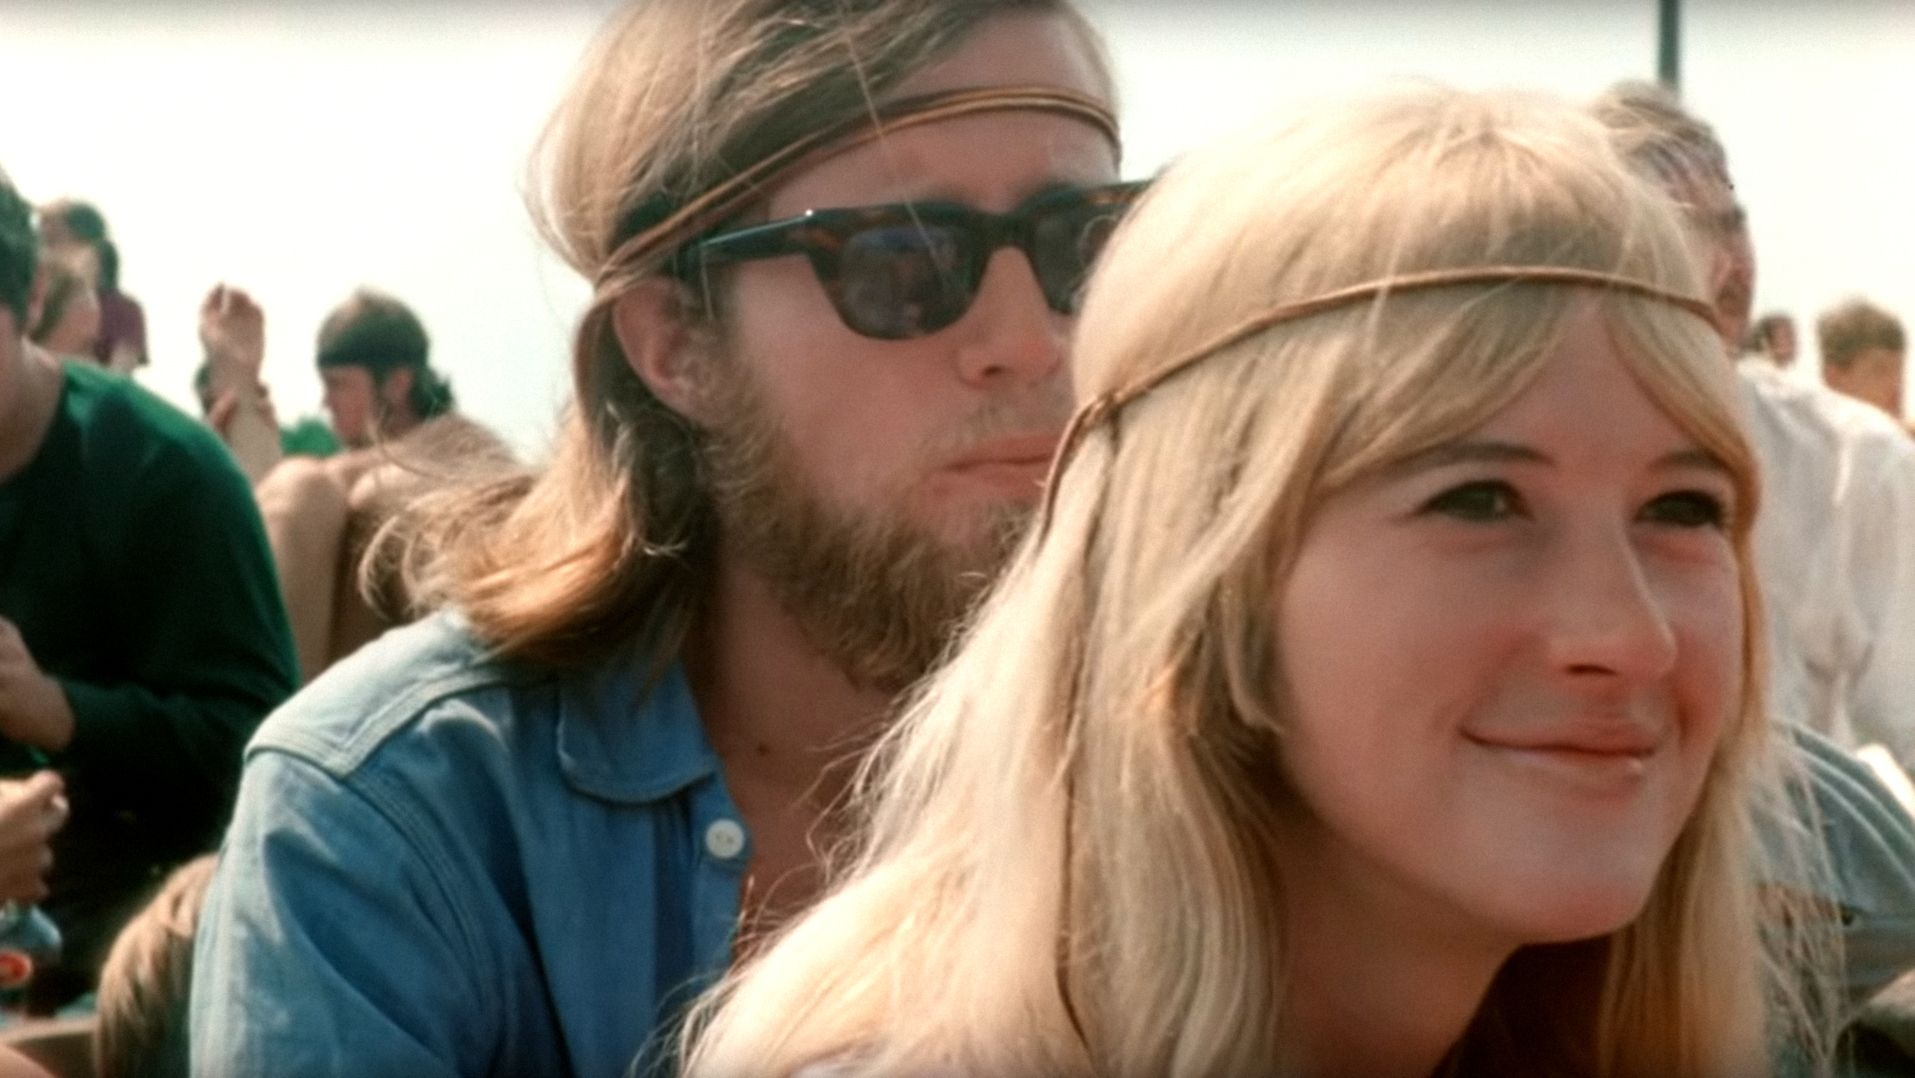 Besucher in Woodstock: Paar mit langen Haaren und Lederbänden um den Kopf